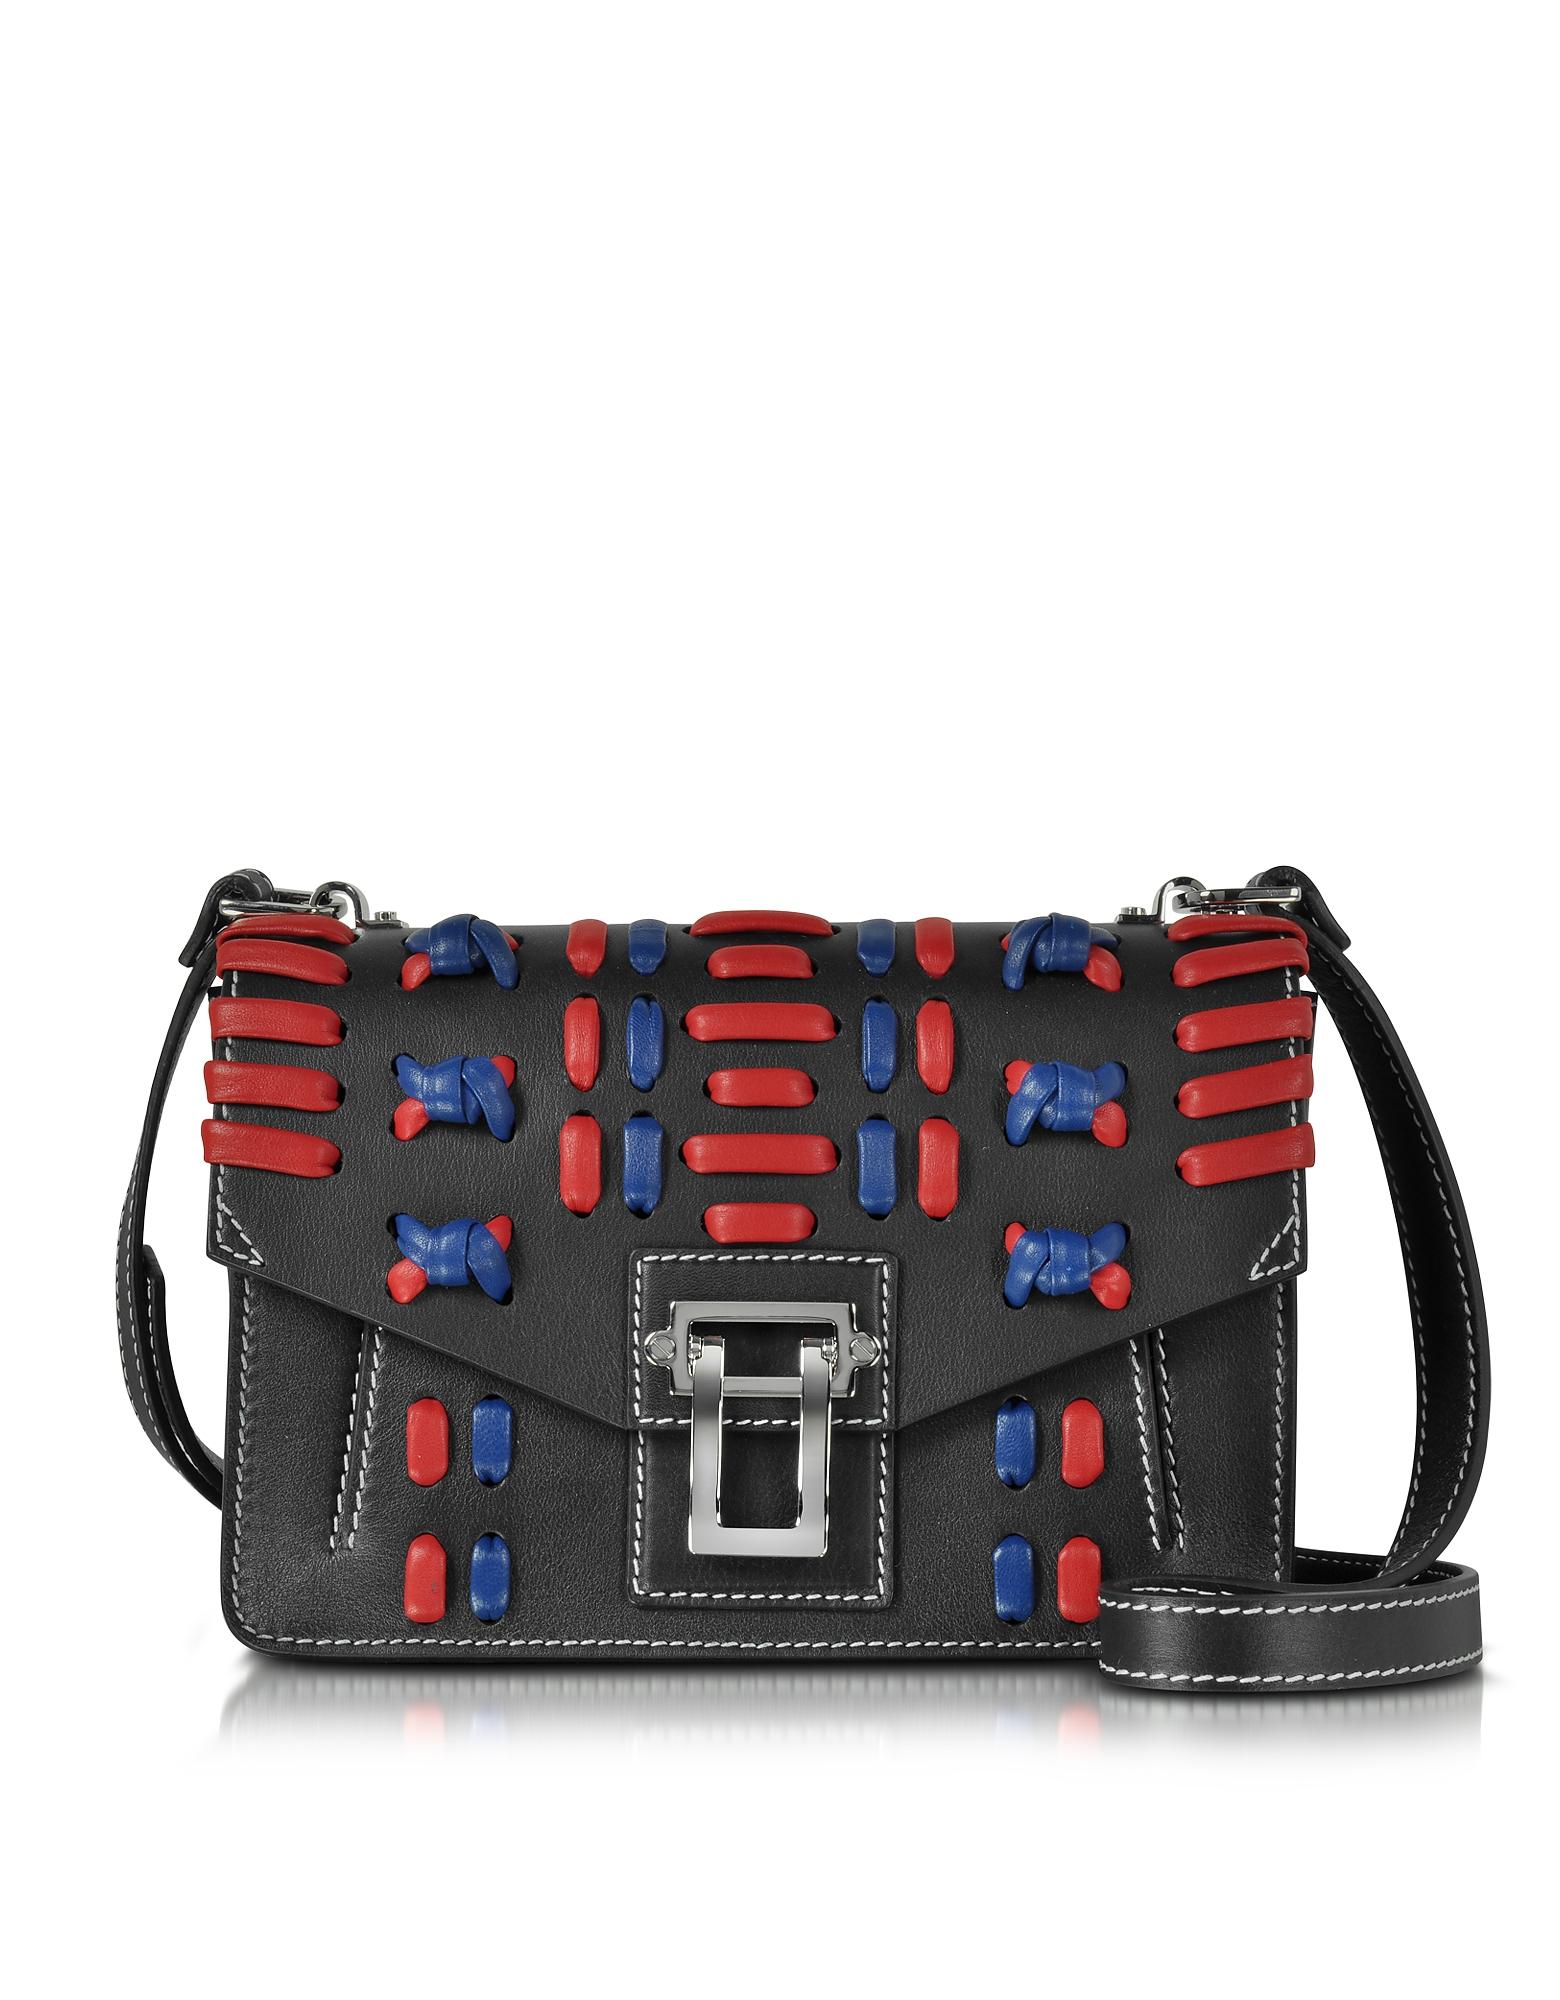 Proenza Schouler Handbags, Black Soft Leather Hava Shoulder Bag